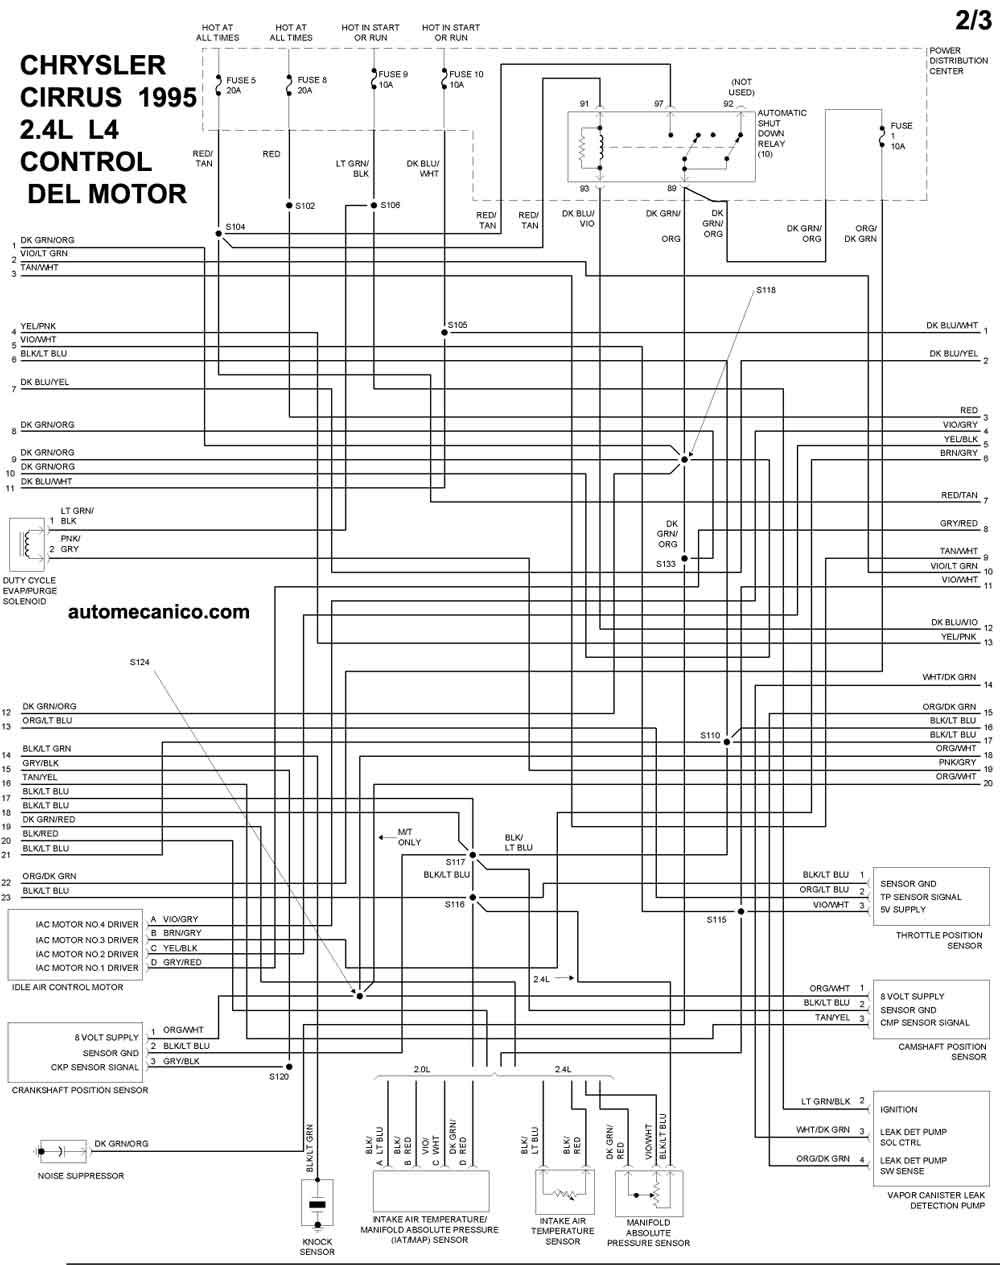 chrysler la Diagrama del motor